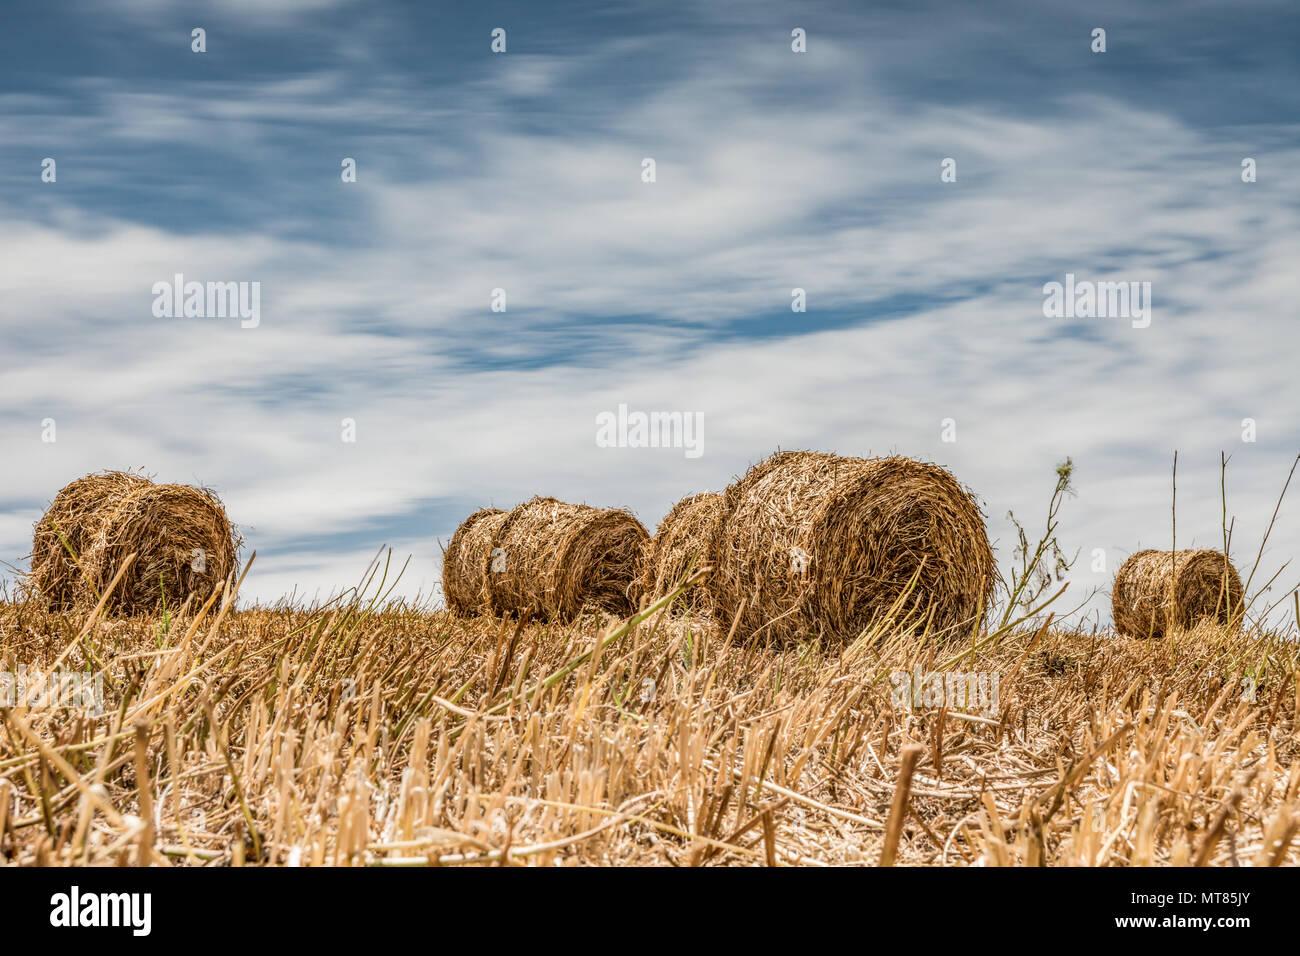 HAY BALES - Stock Image